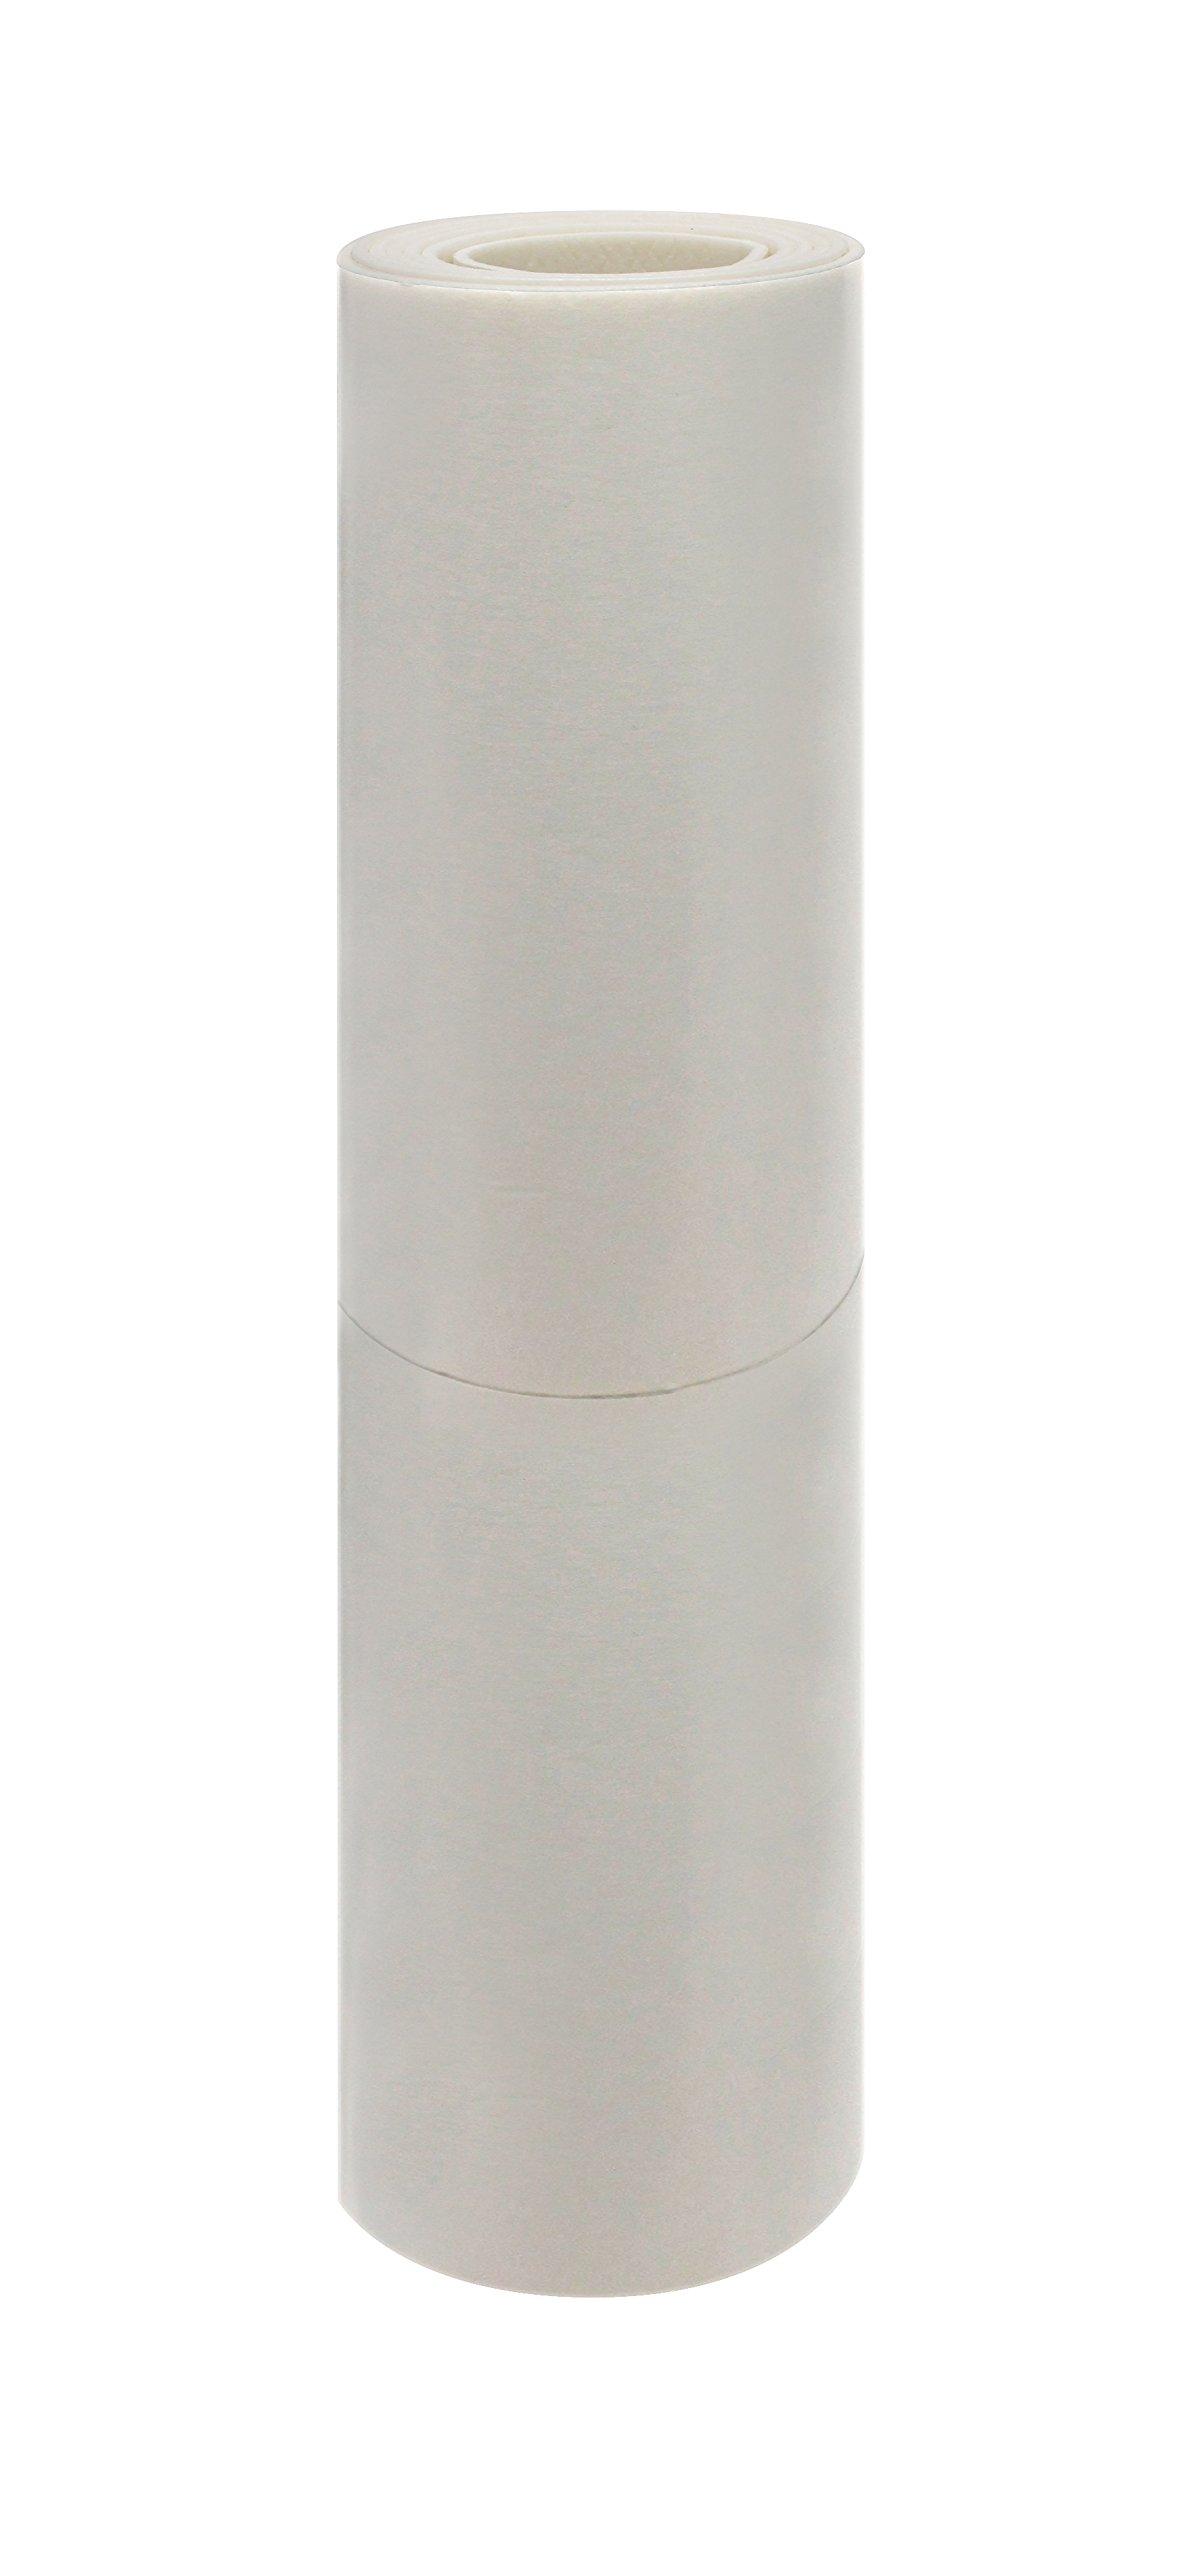 Plumb Pak K836-22 Toilet Accessory, Liner, Tank Insert, White